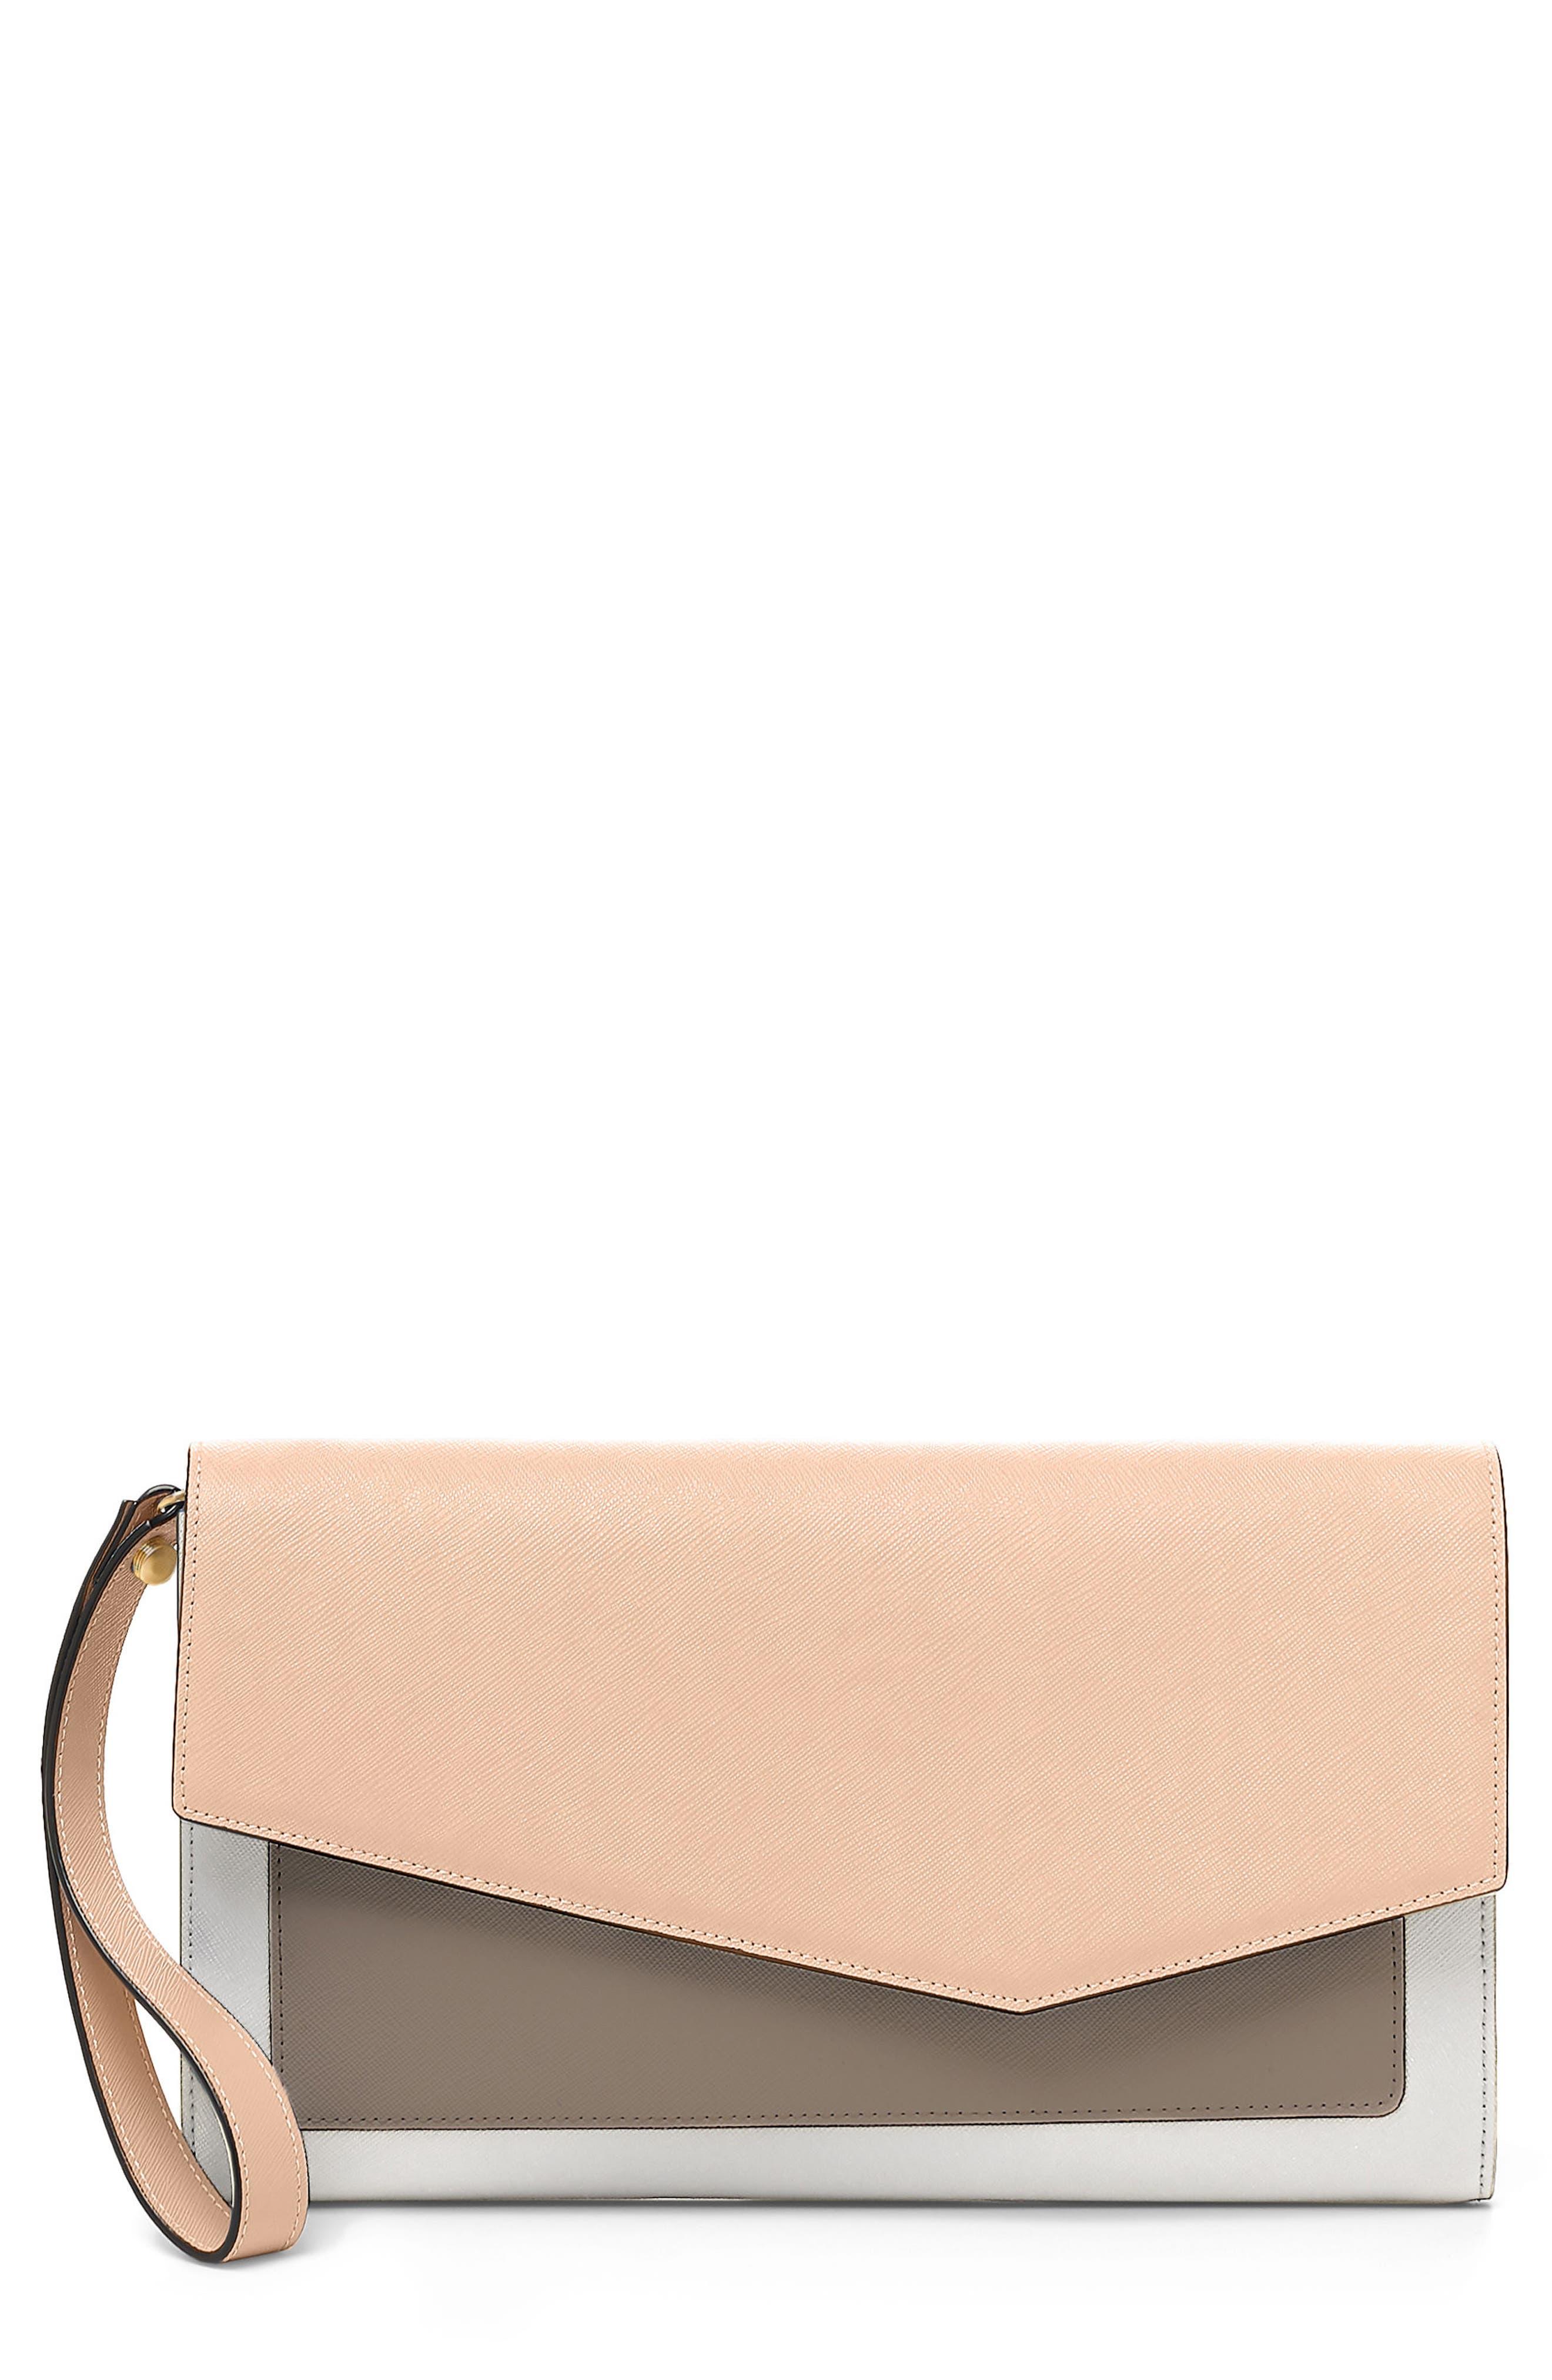 Cobble Hill Leather Wallet,                             Main thumbnail 1, color,                             Peach Colorblock